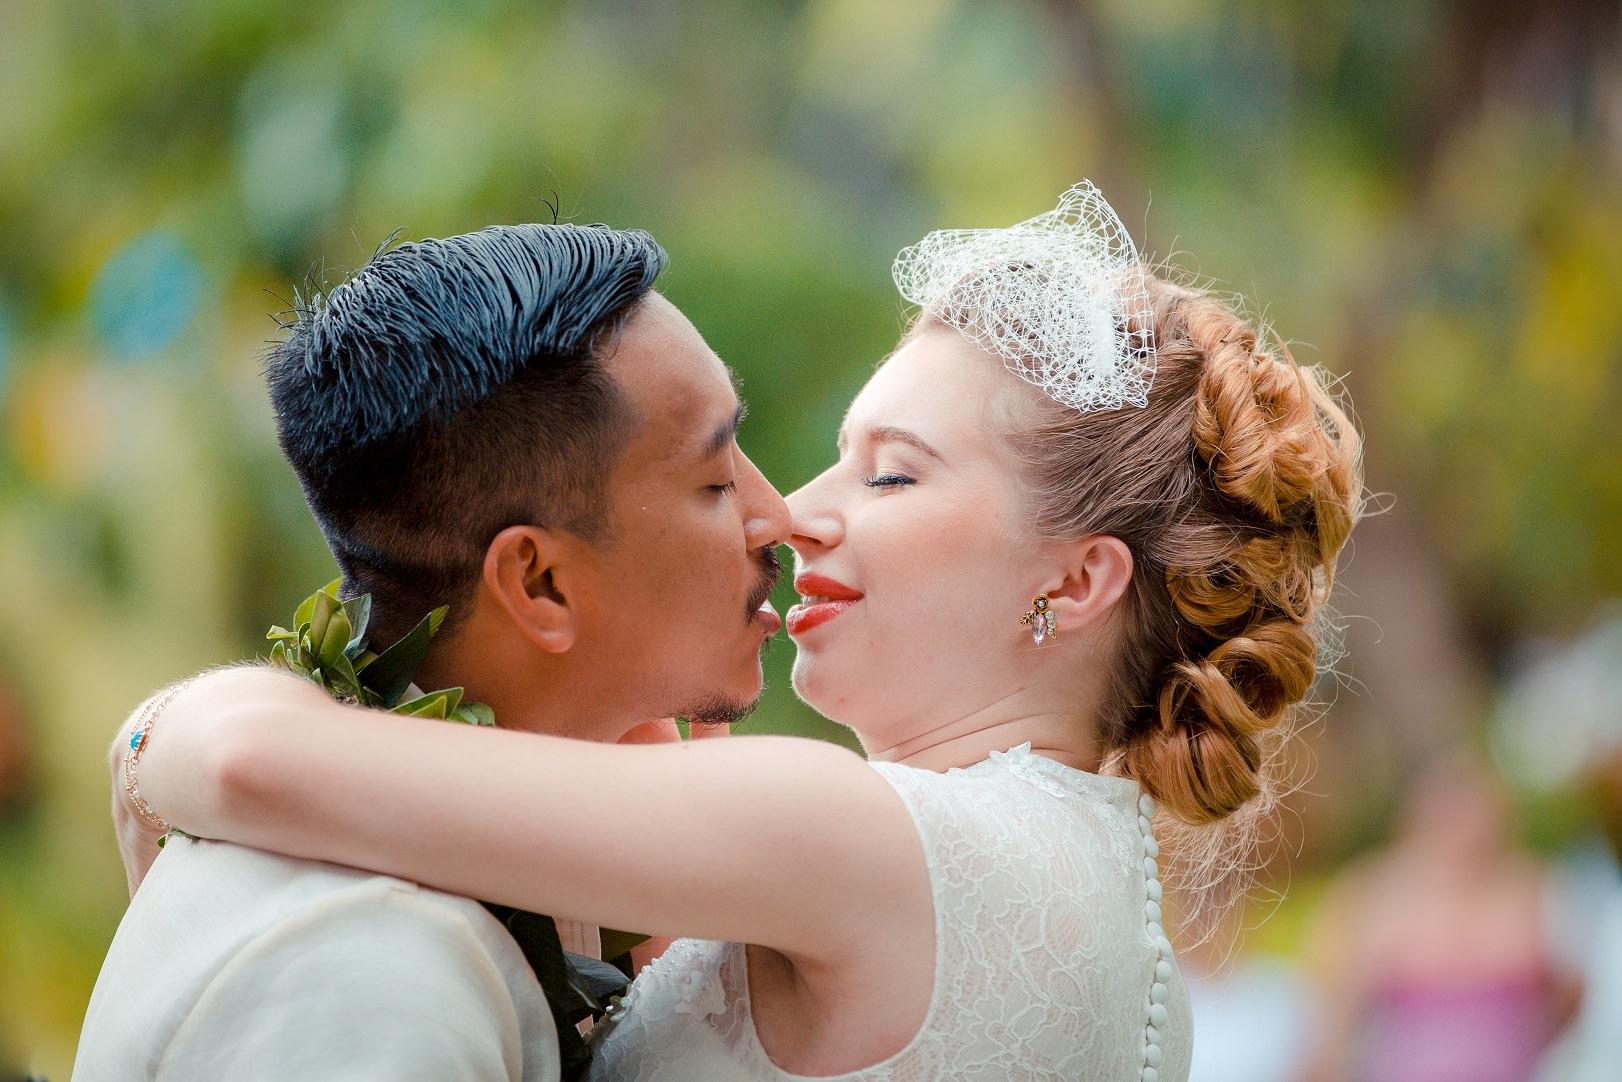 That moment just before the newly married couple kisses! @ the Hale Koa Hotel, Waikiki Oahu Hawaii